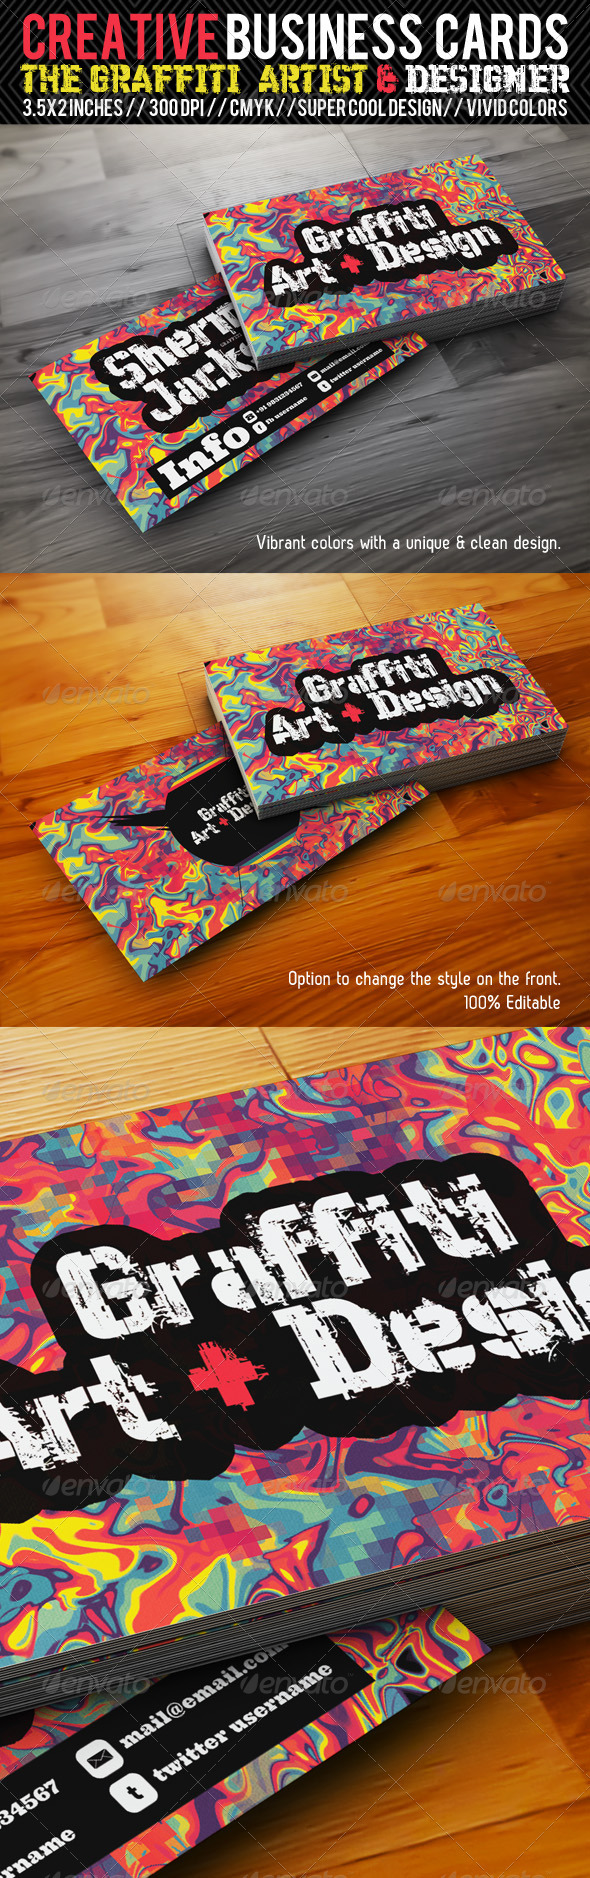 Creative Business Card#3-Grafitti Art & Designer - Creative Business Cards